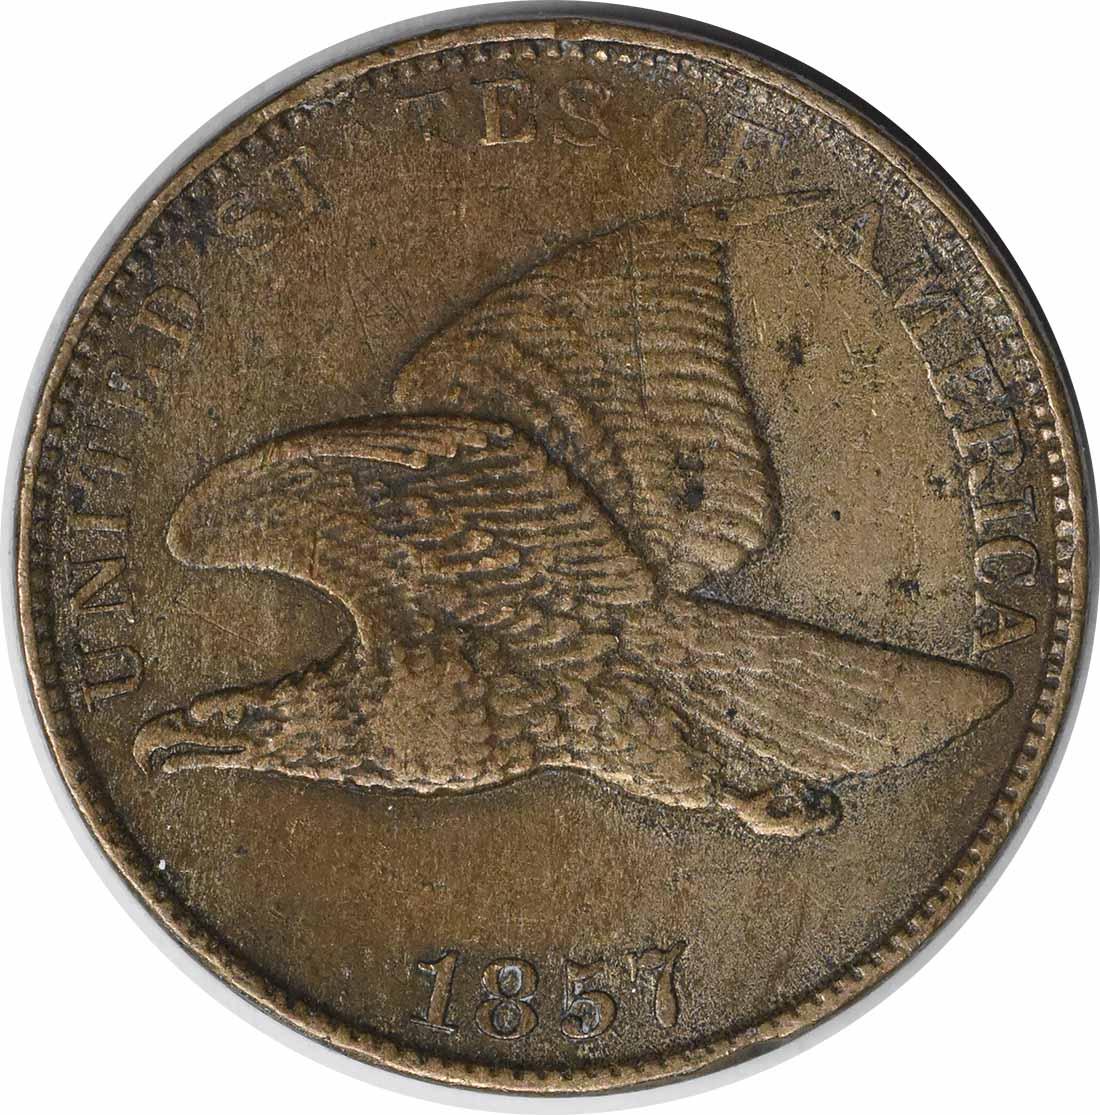 1857 Flying Eagle Cent EF Uncertified #1050